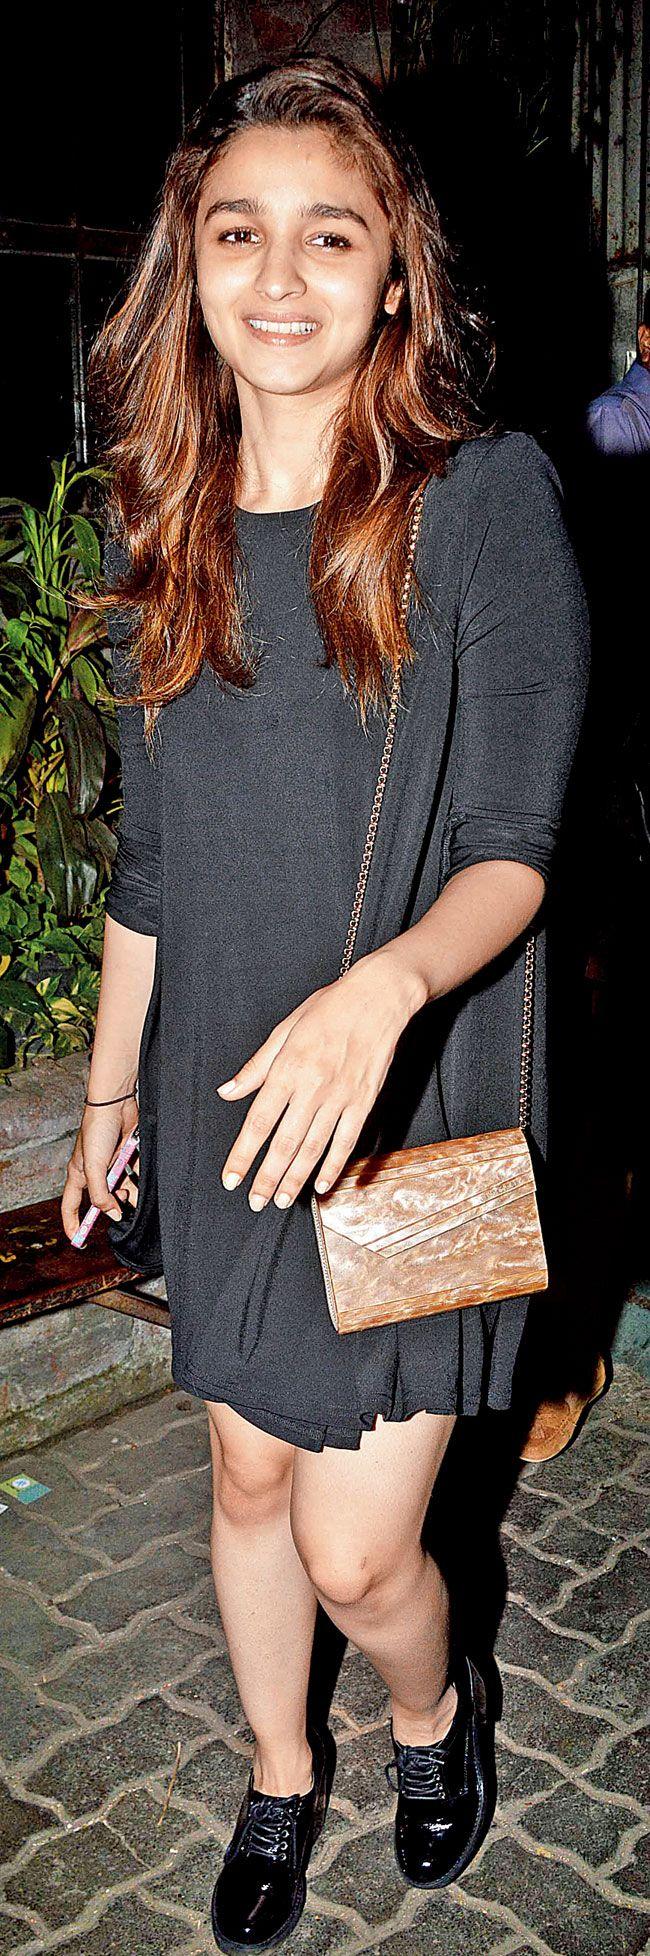 Alia Bhatt at Andheri. #Bollywood #Fashion #Style #Beauty